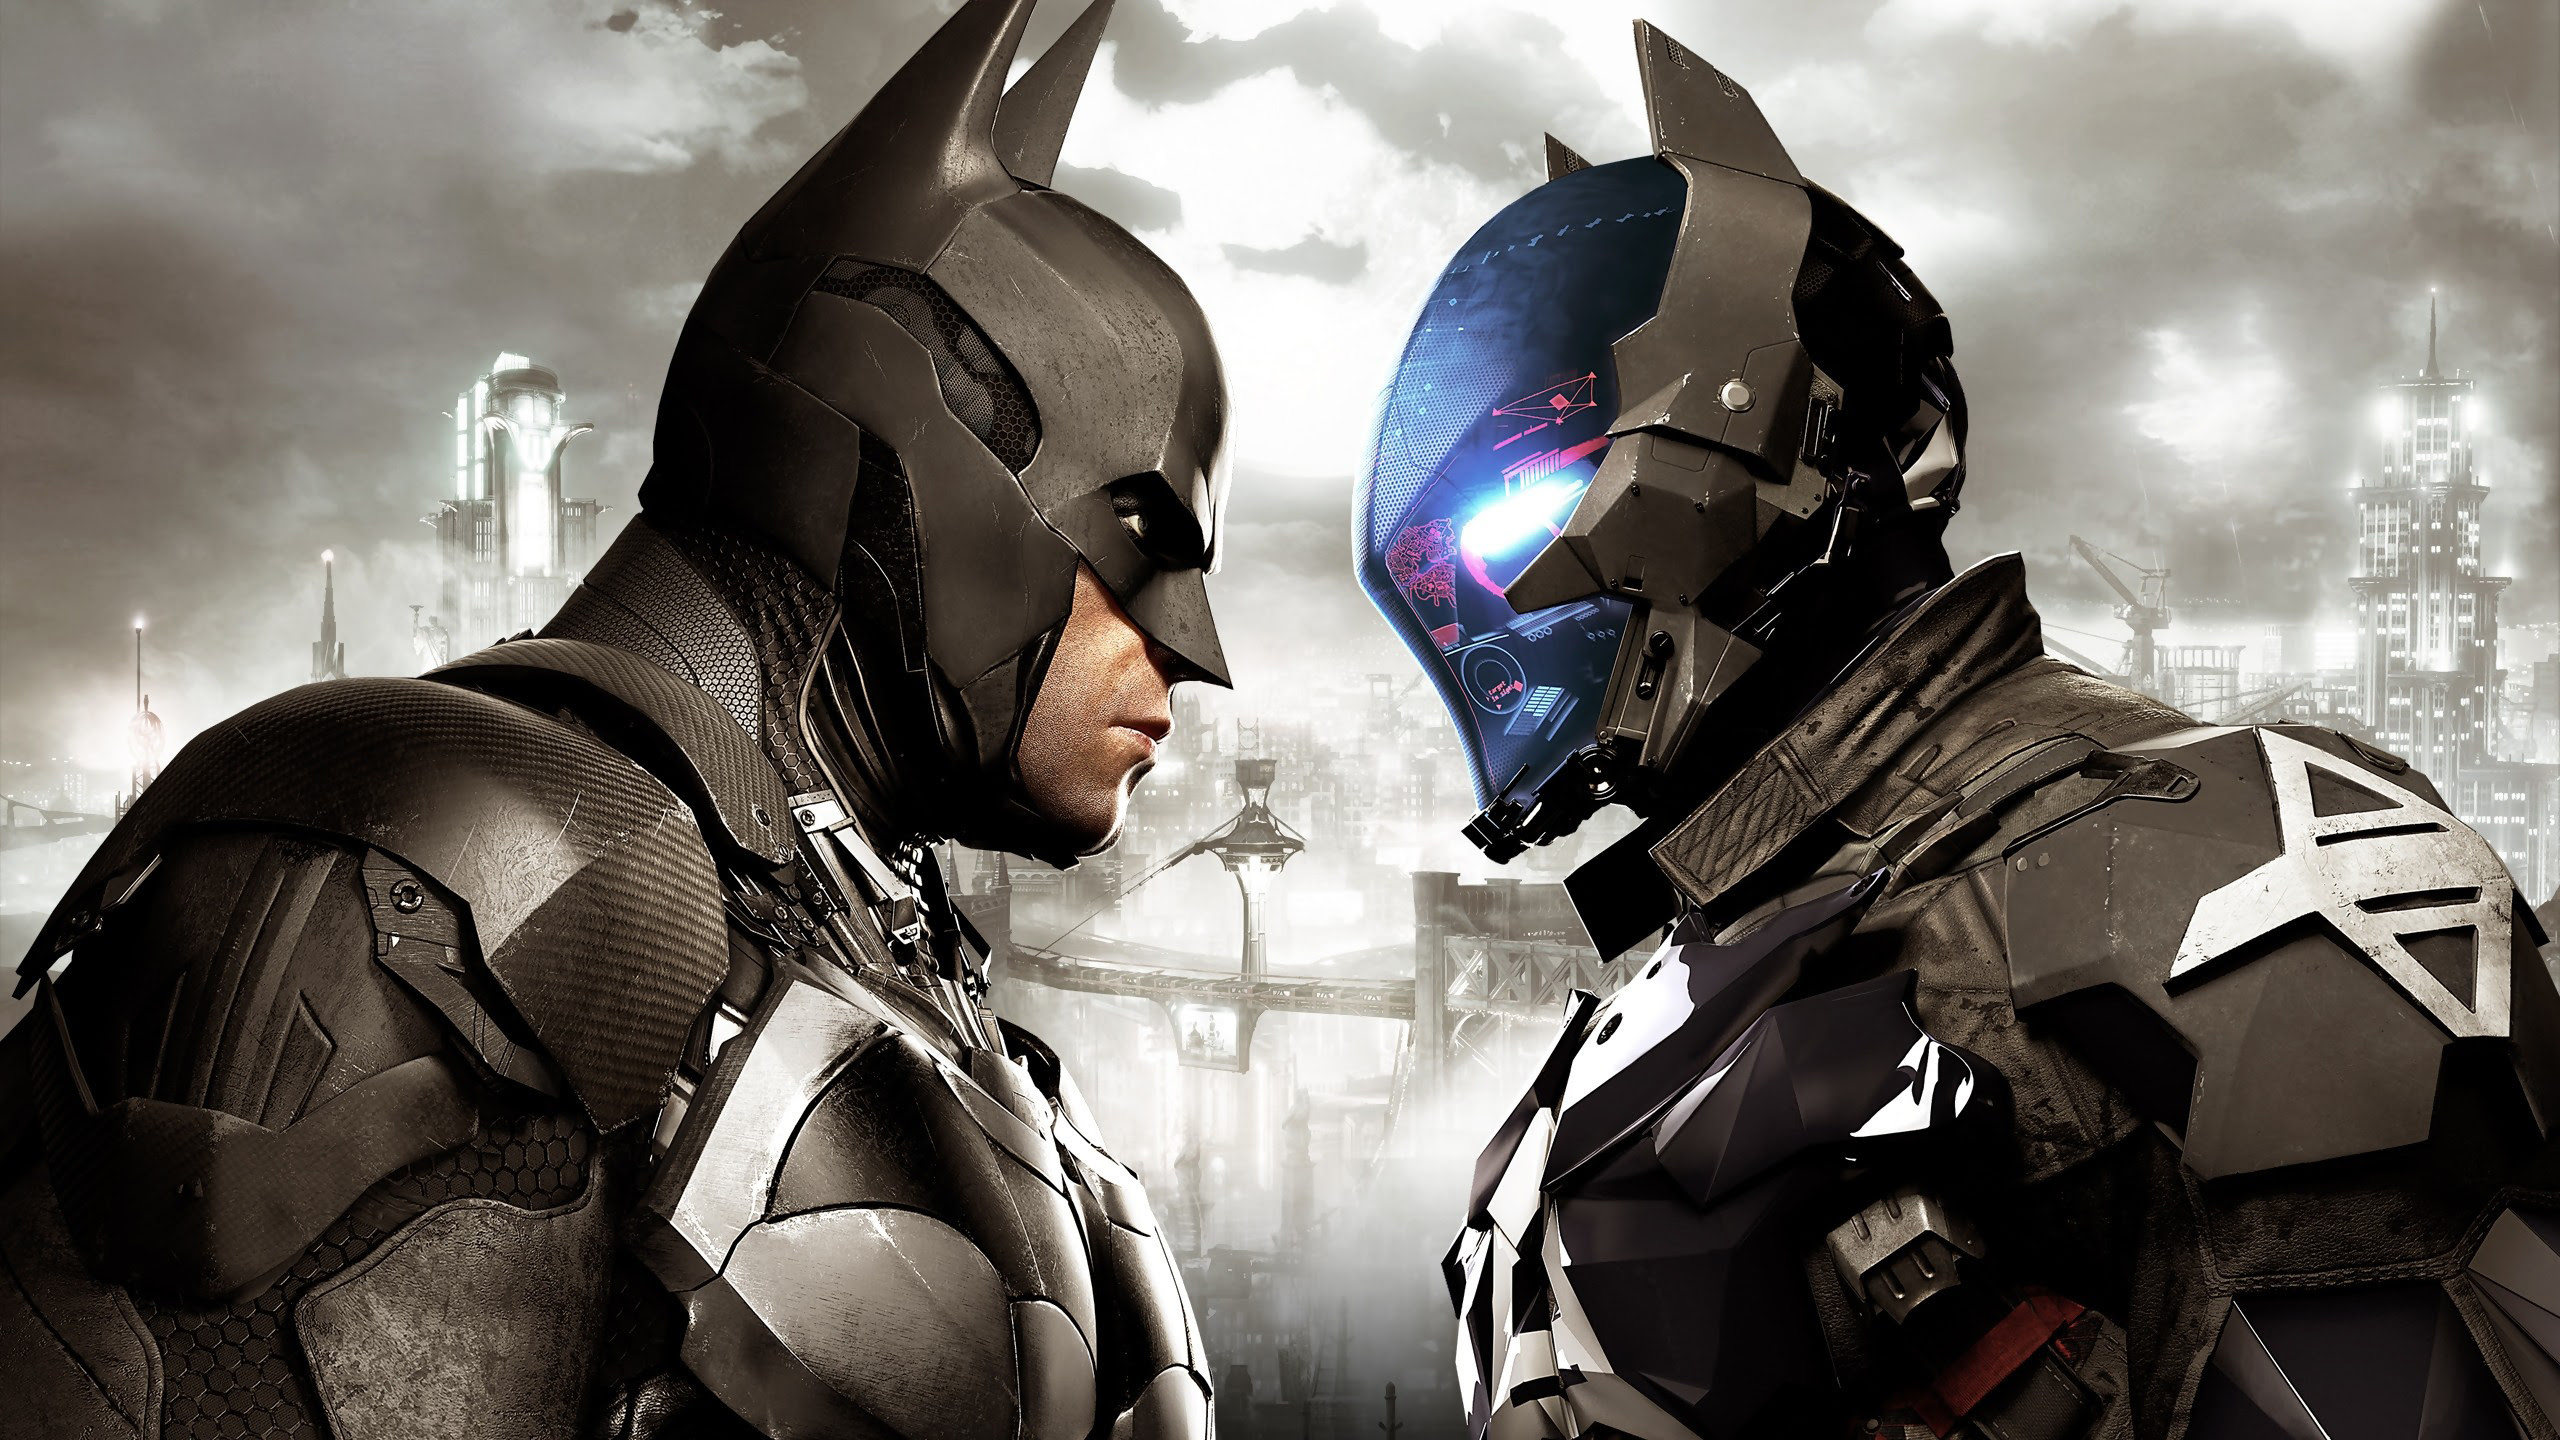 Batman Arkham Knight Wallpaper Hd 75 Images